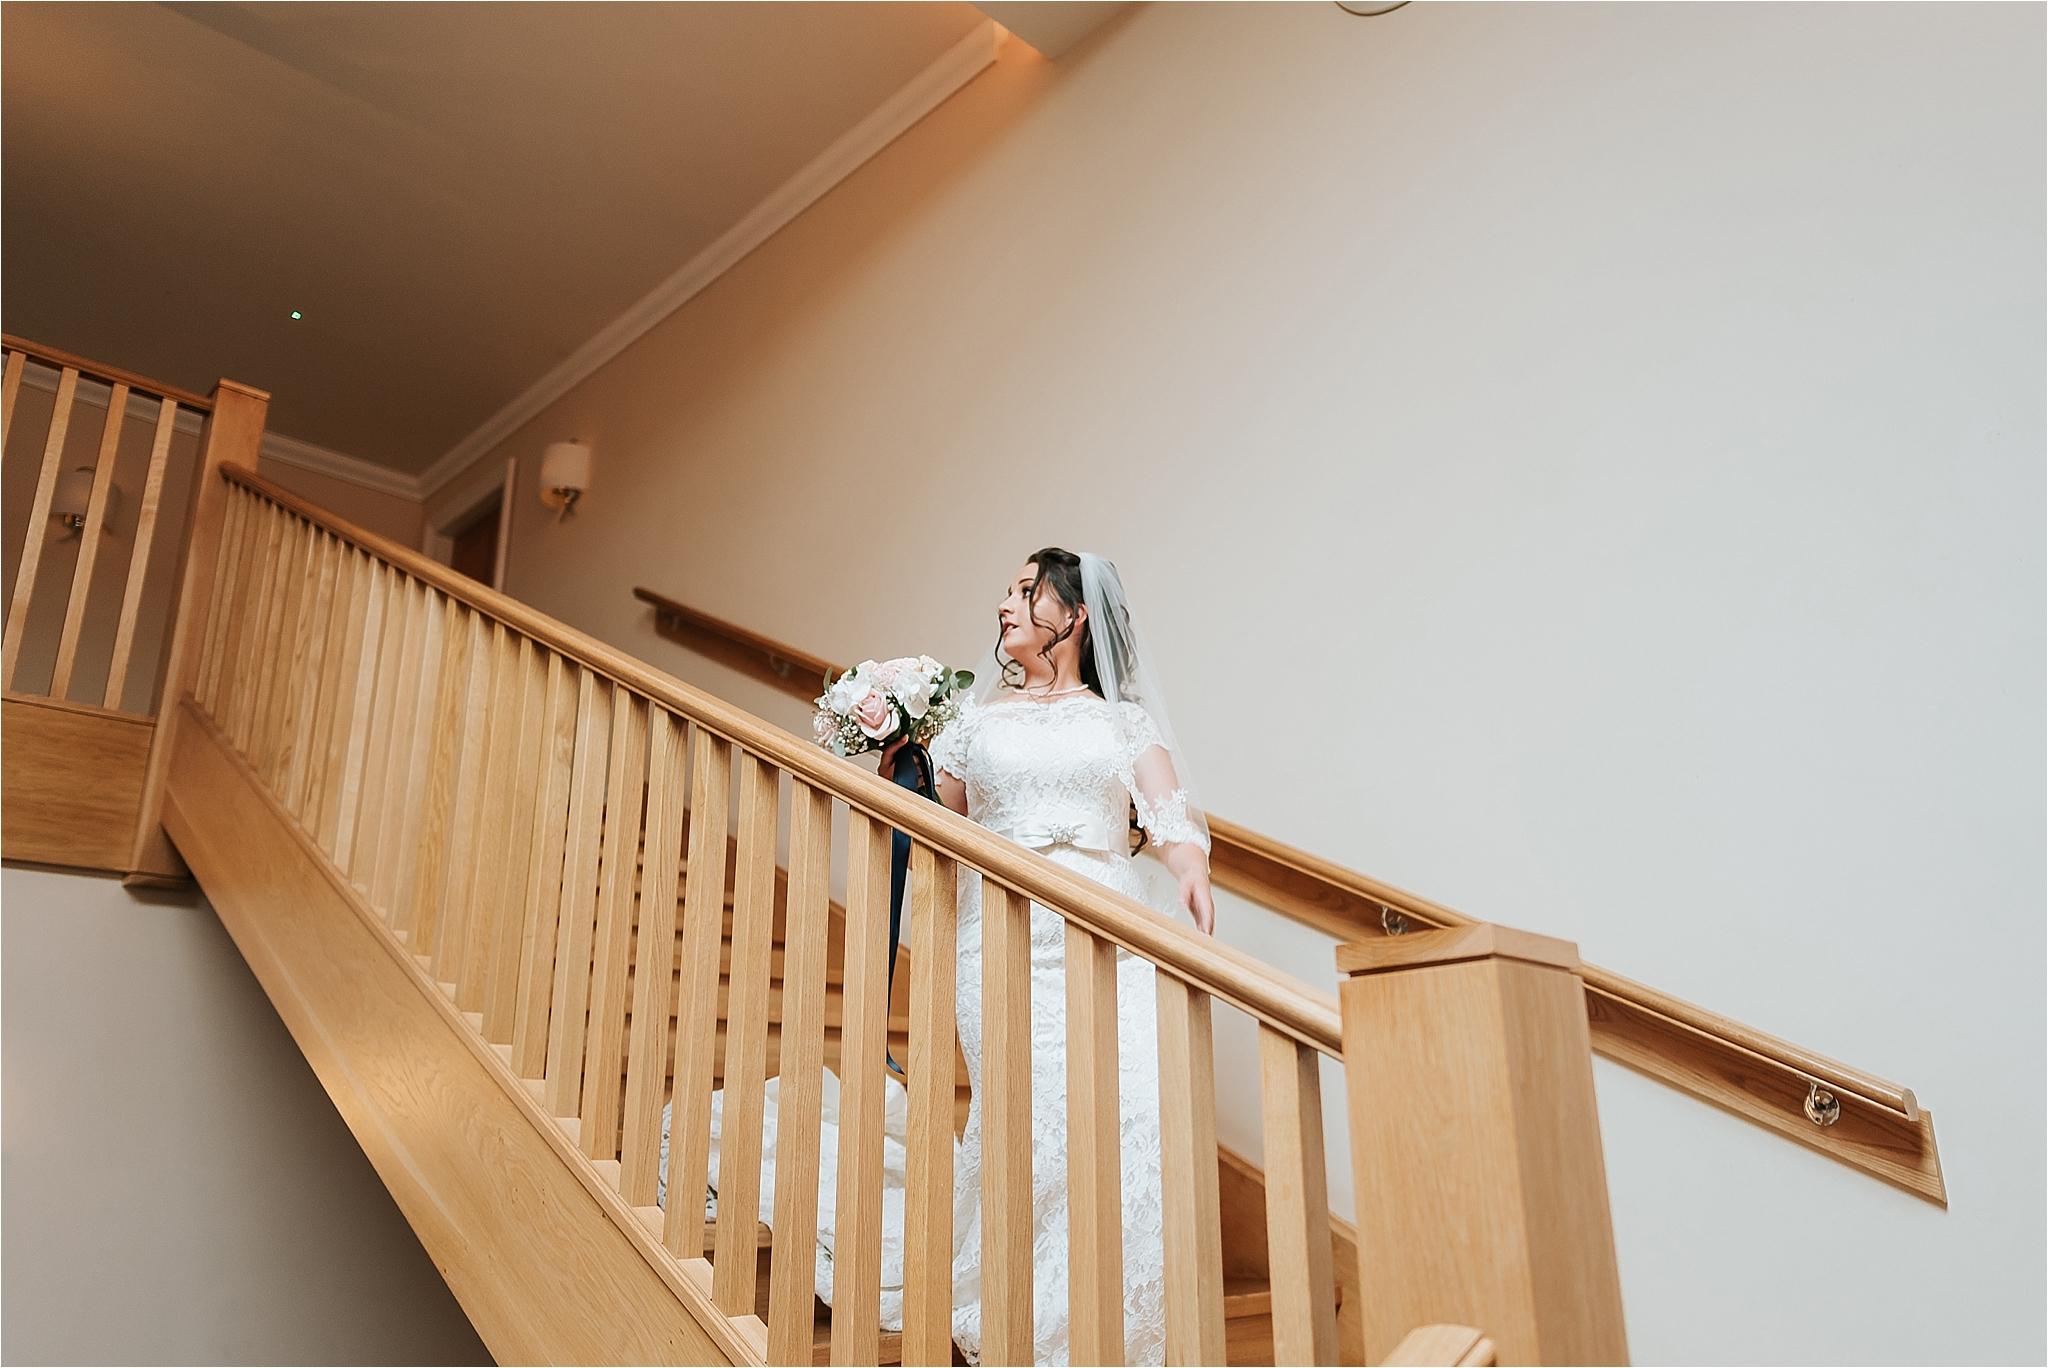 thevilla+lancashire+wreagreen+wedding+photographer94.jpg